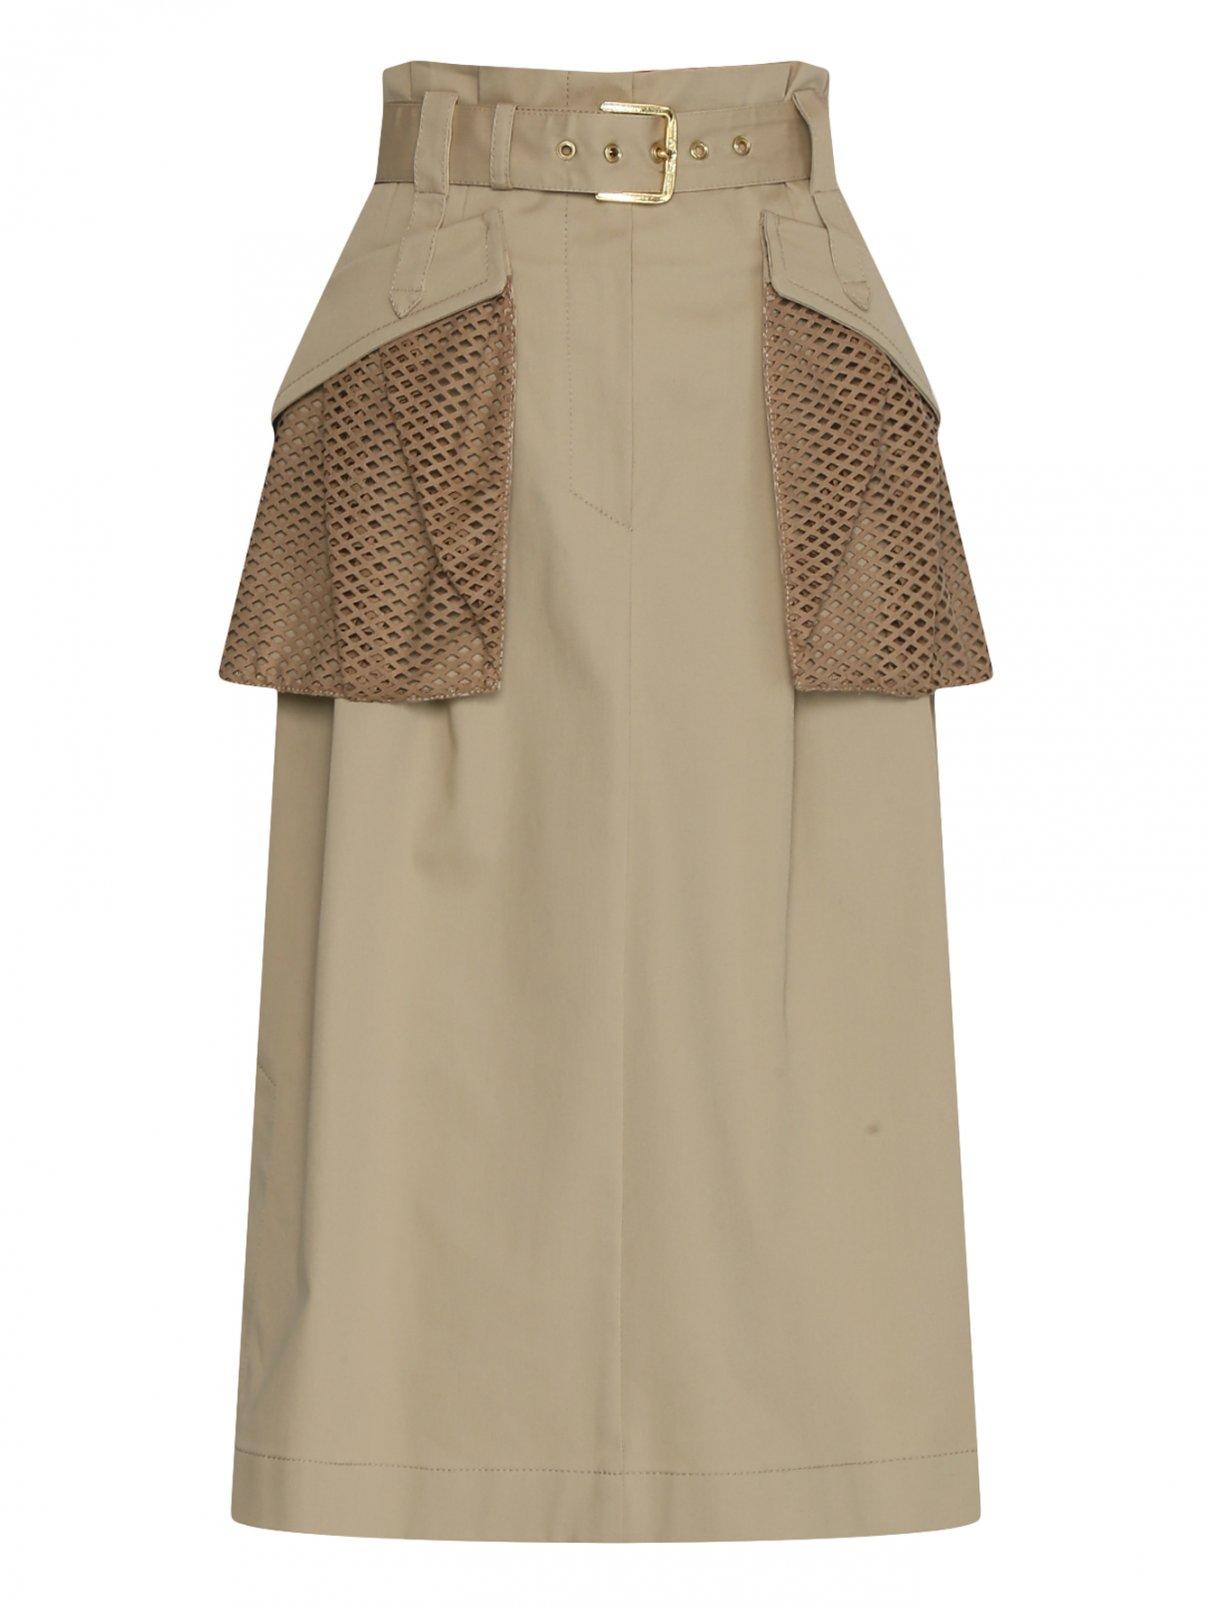 Юбка из хлопка с накладными карманами Alberta Ferretti  –  Общий вид